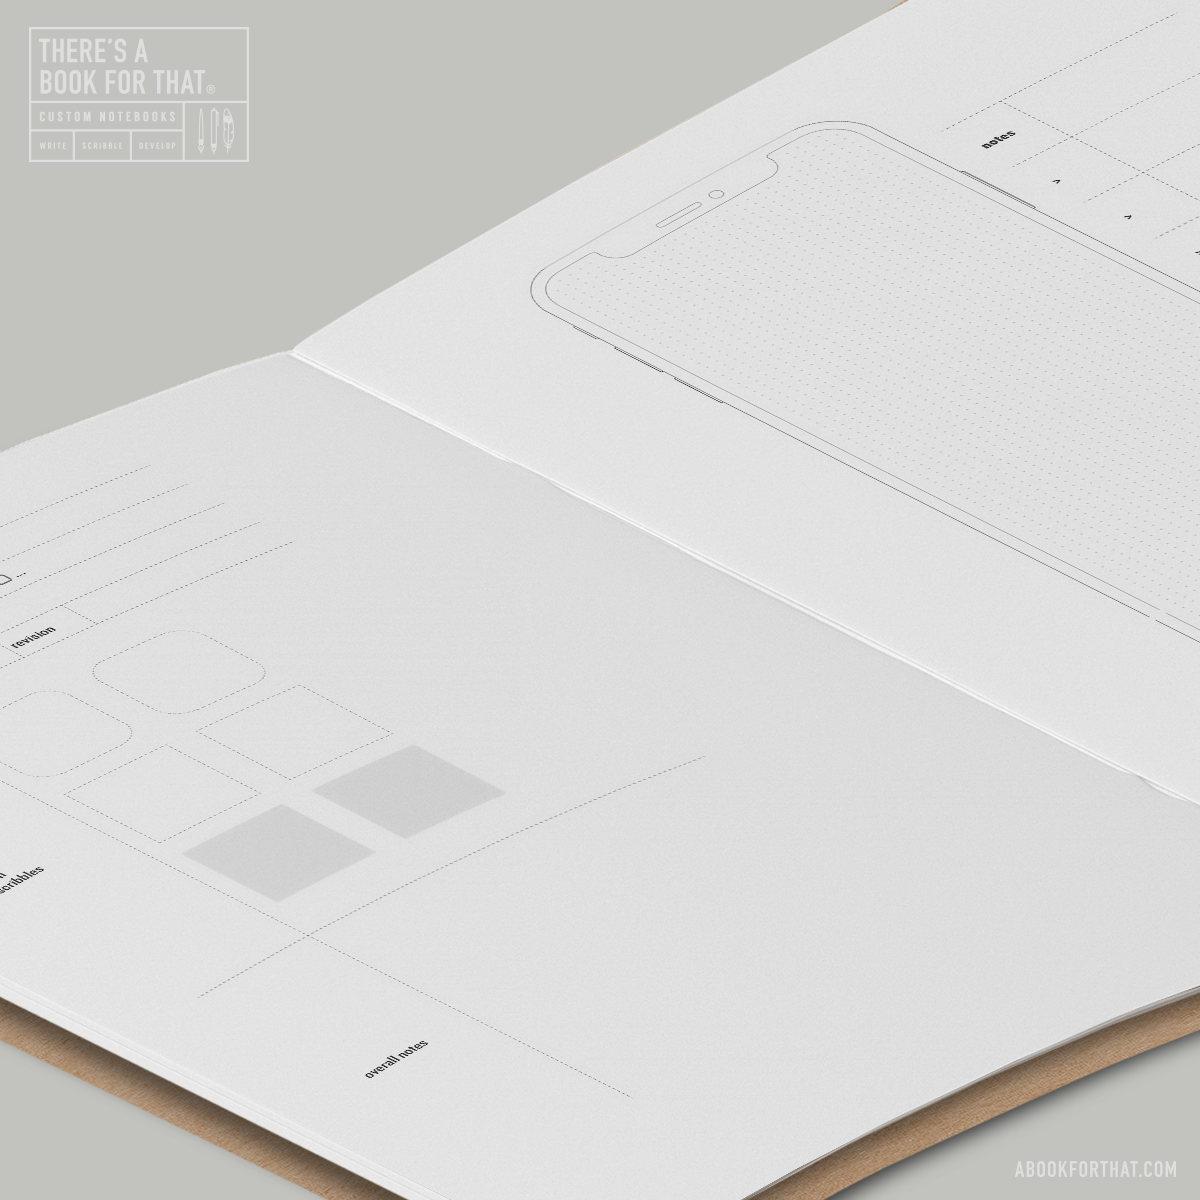 B-115_App-Mockup-Notebook_Stationery_Details1